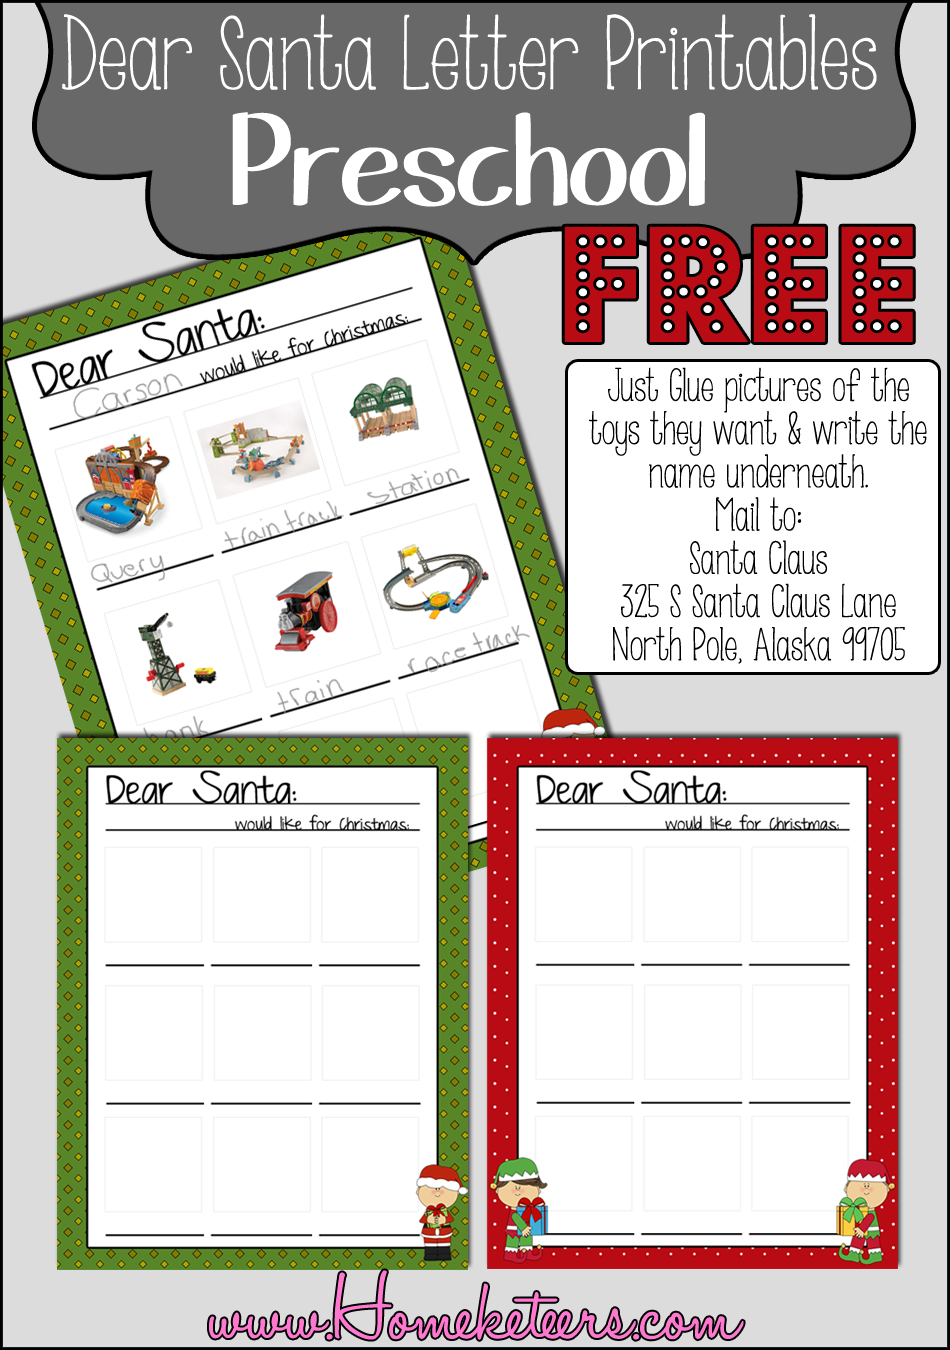 Dear Santa Letters FREE Printables Dear santa, Santa